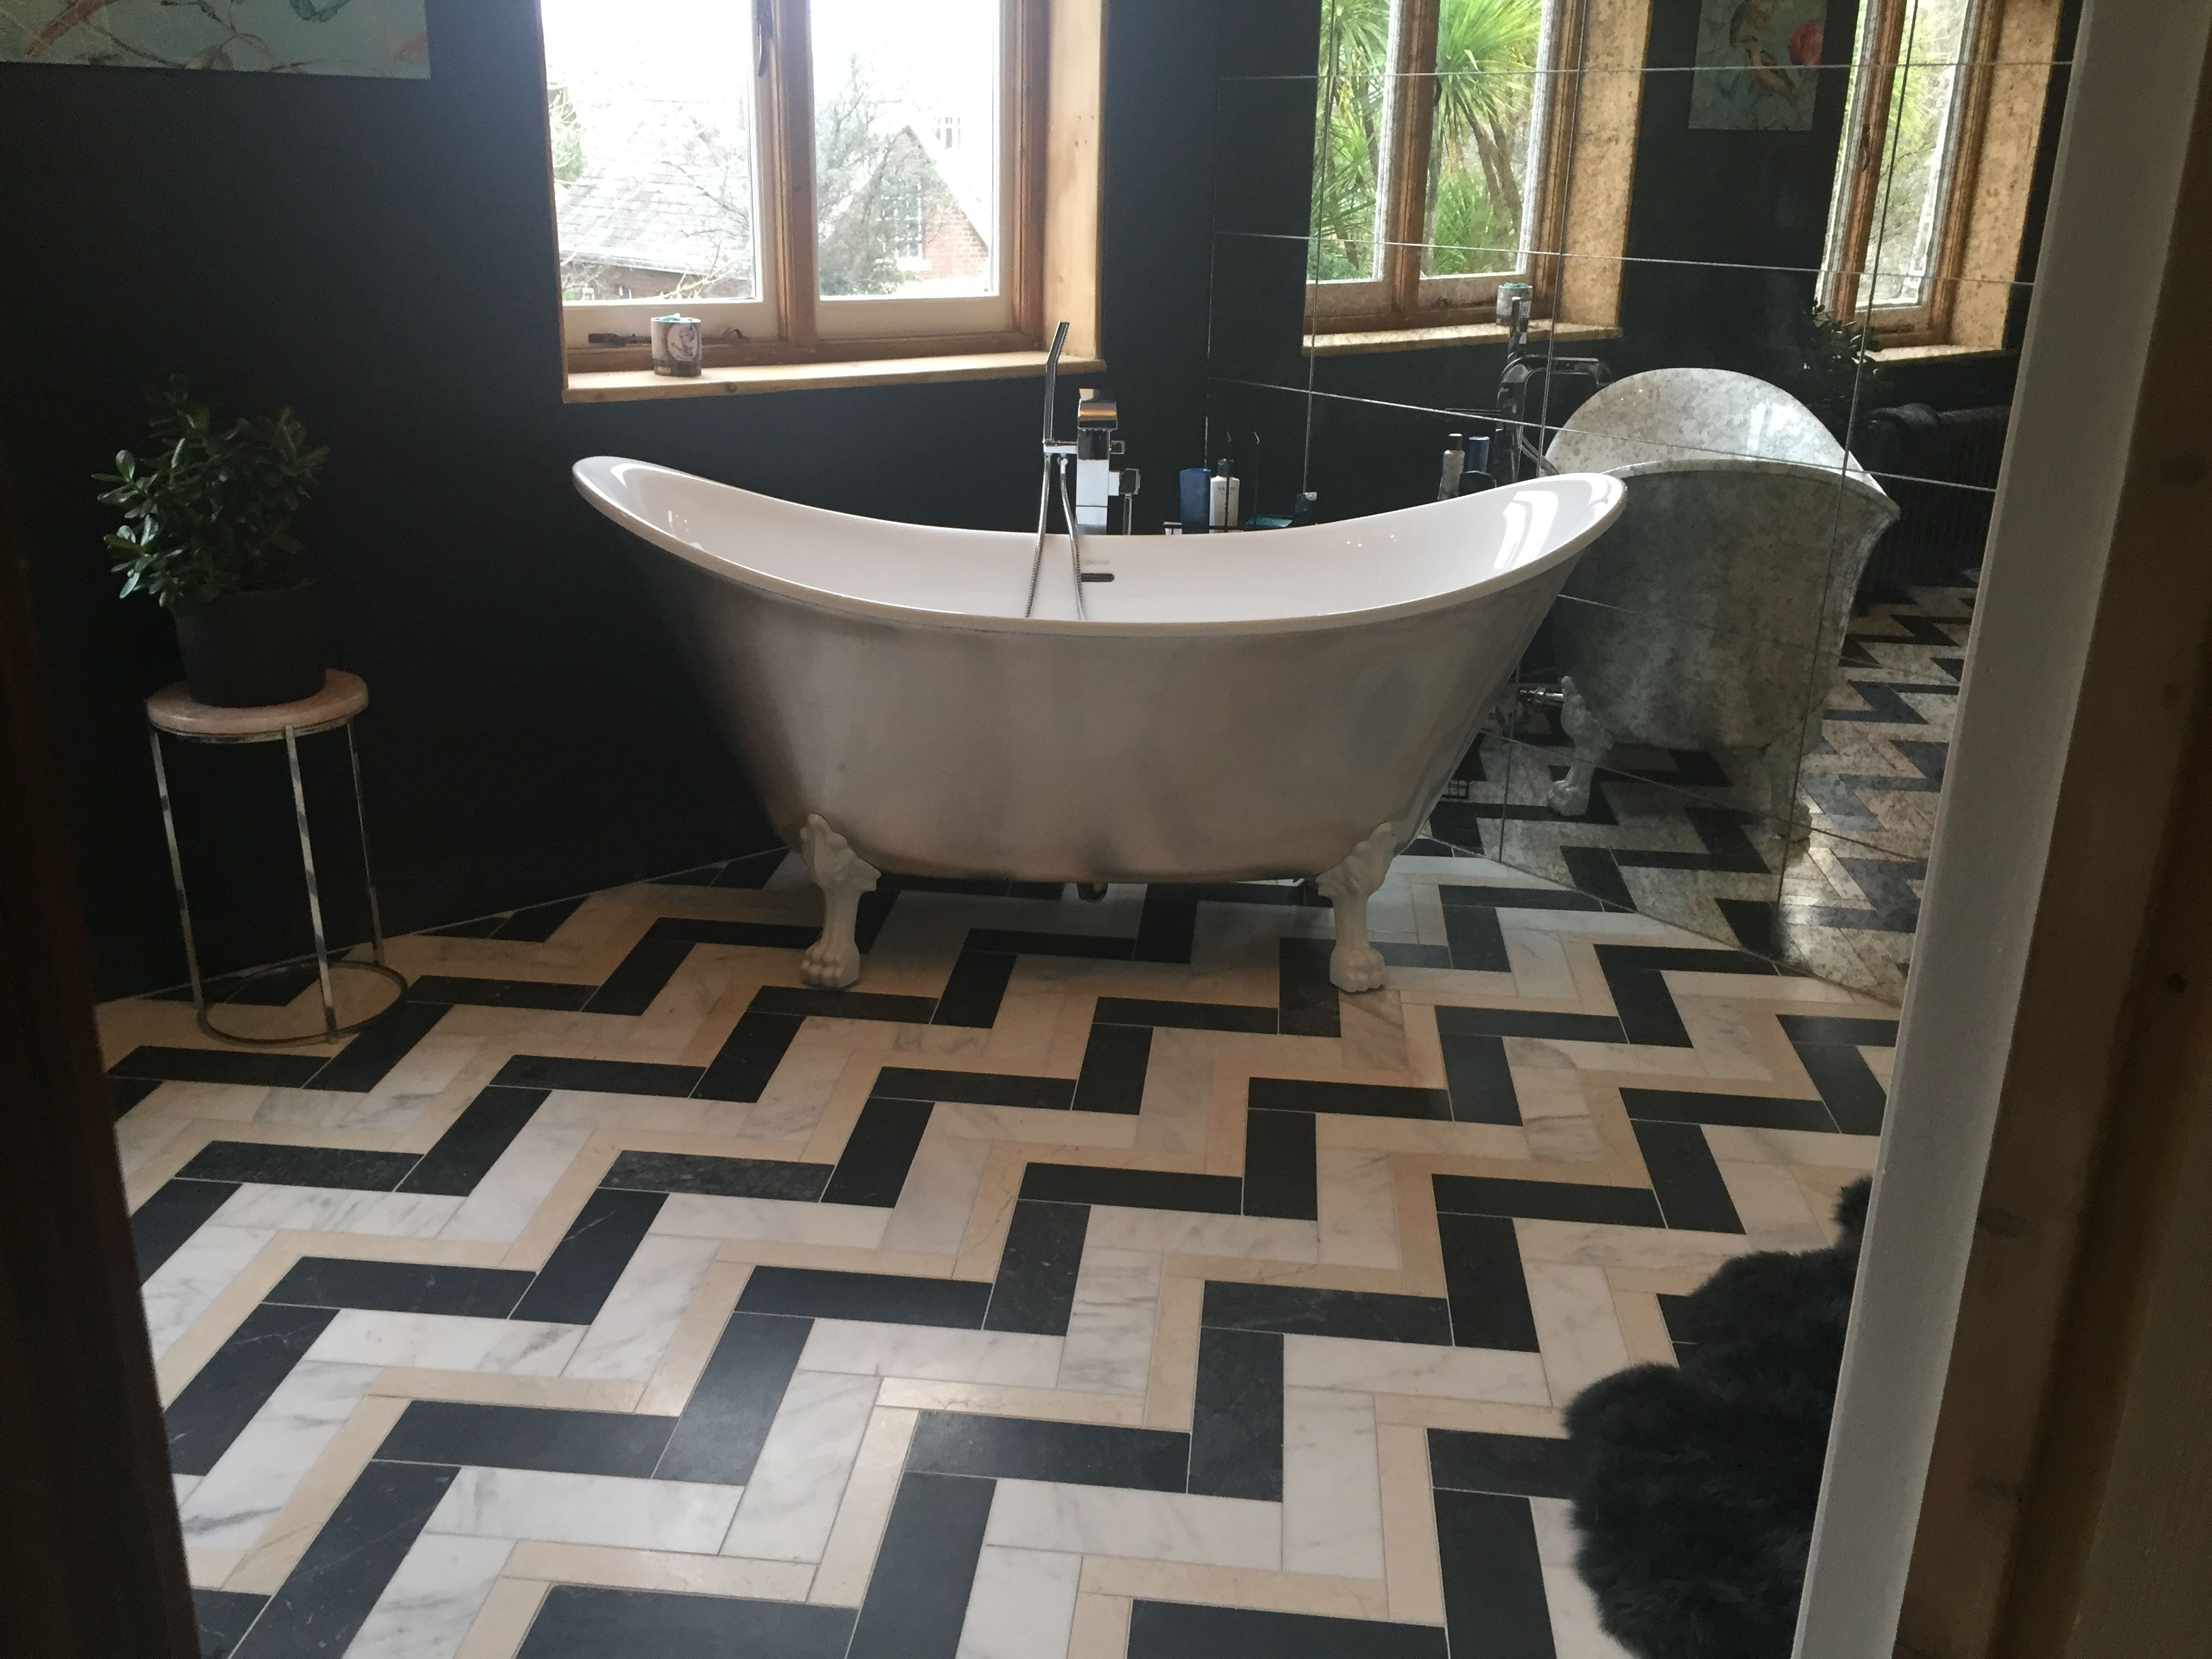 Marble Floor, Style, Herringbone, Bathroom, Swag, Bath Room, Bathrooms, Powder